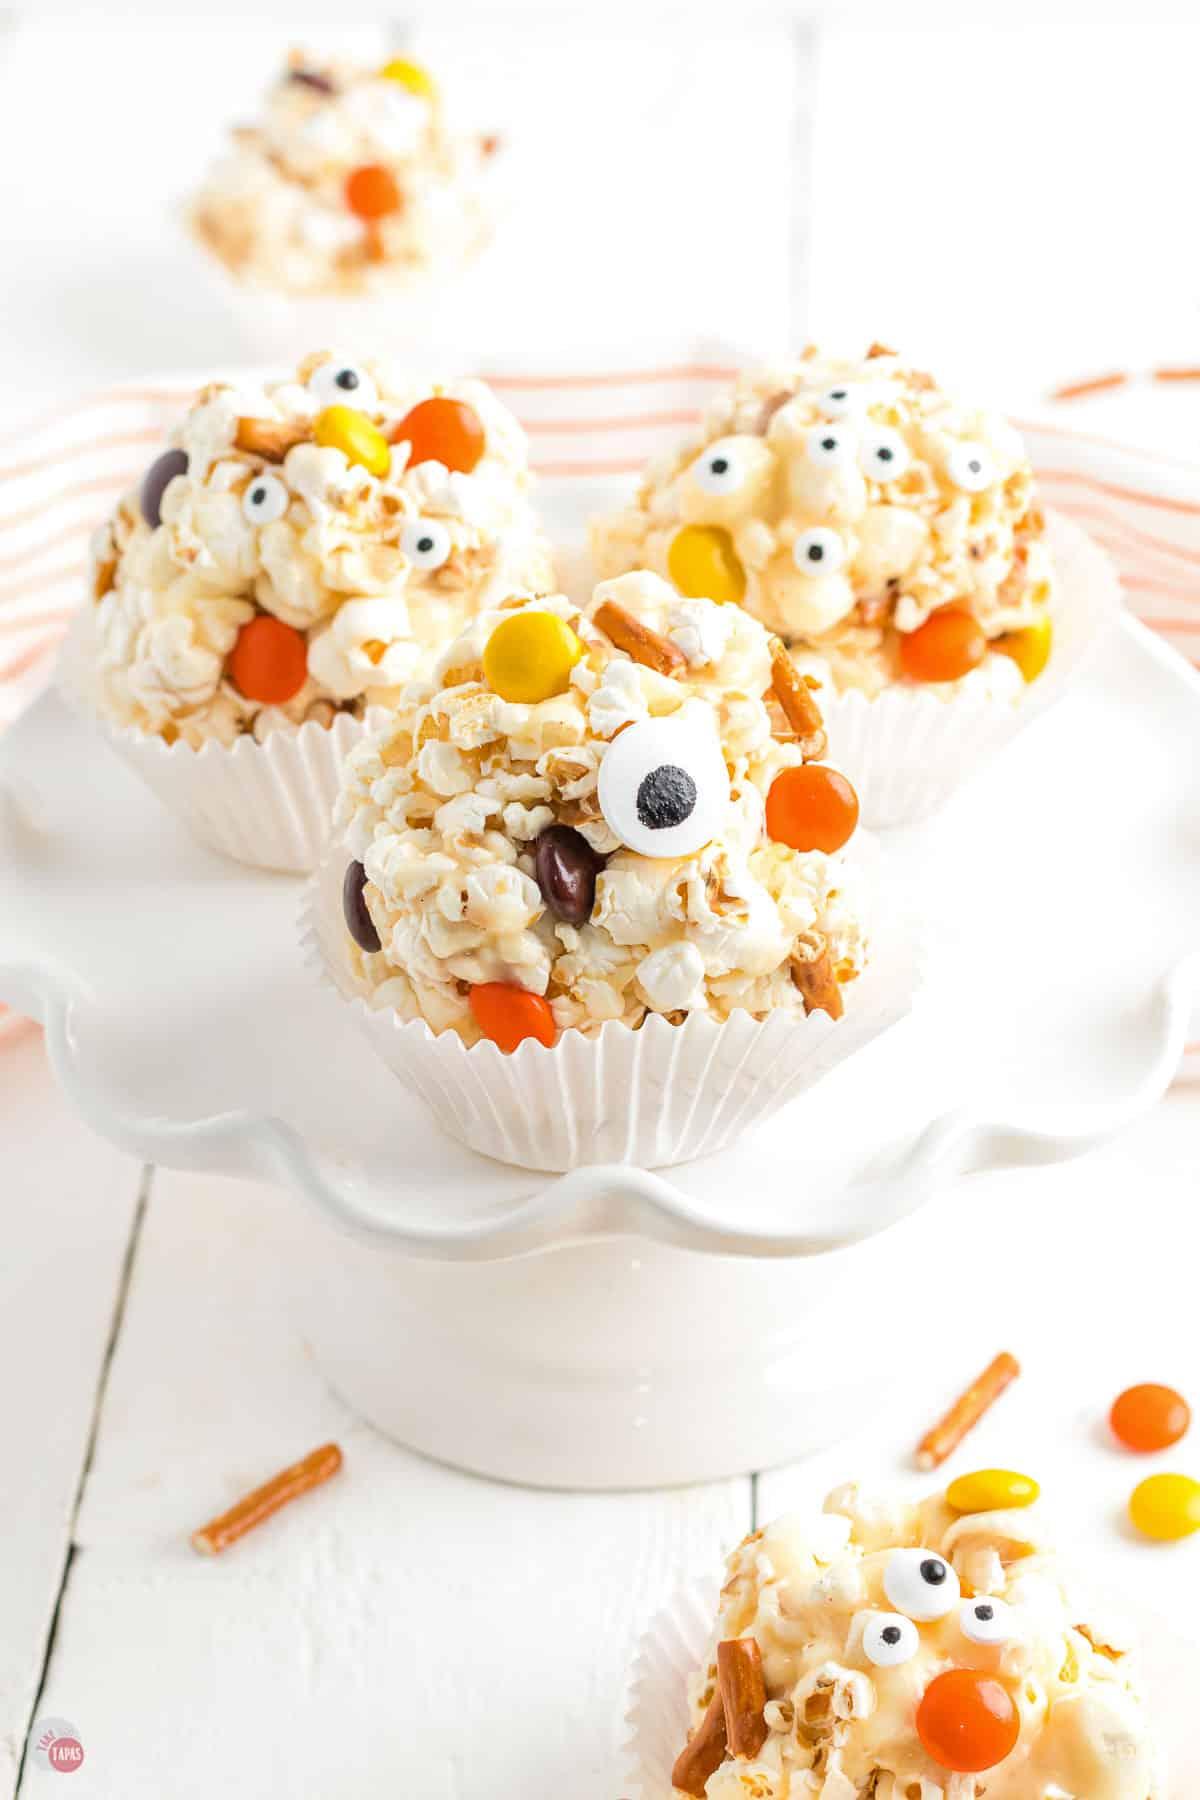 cake plate with popcorn balls